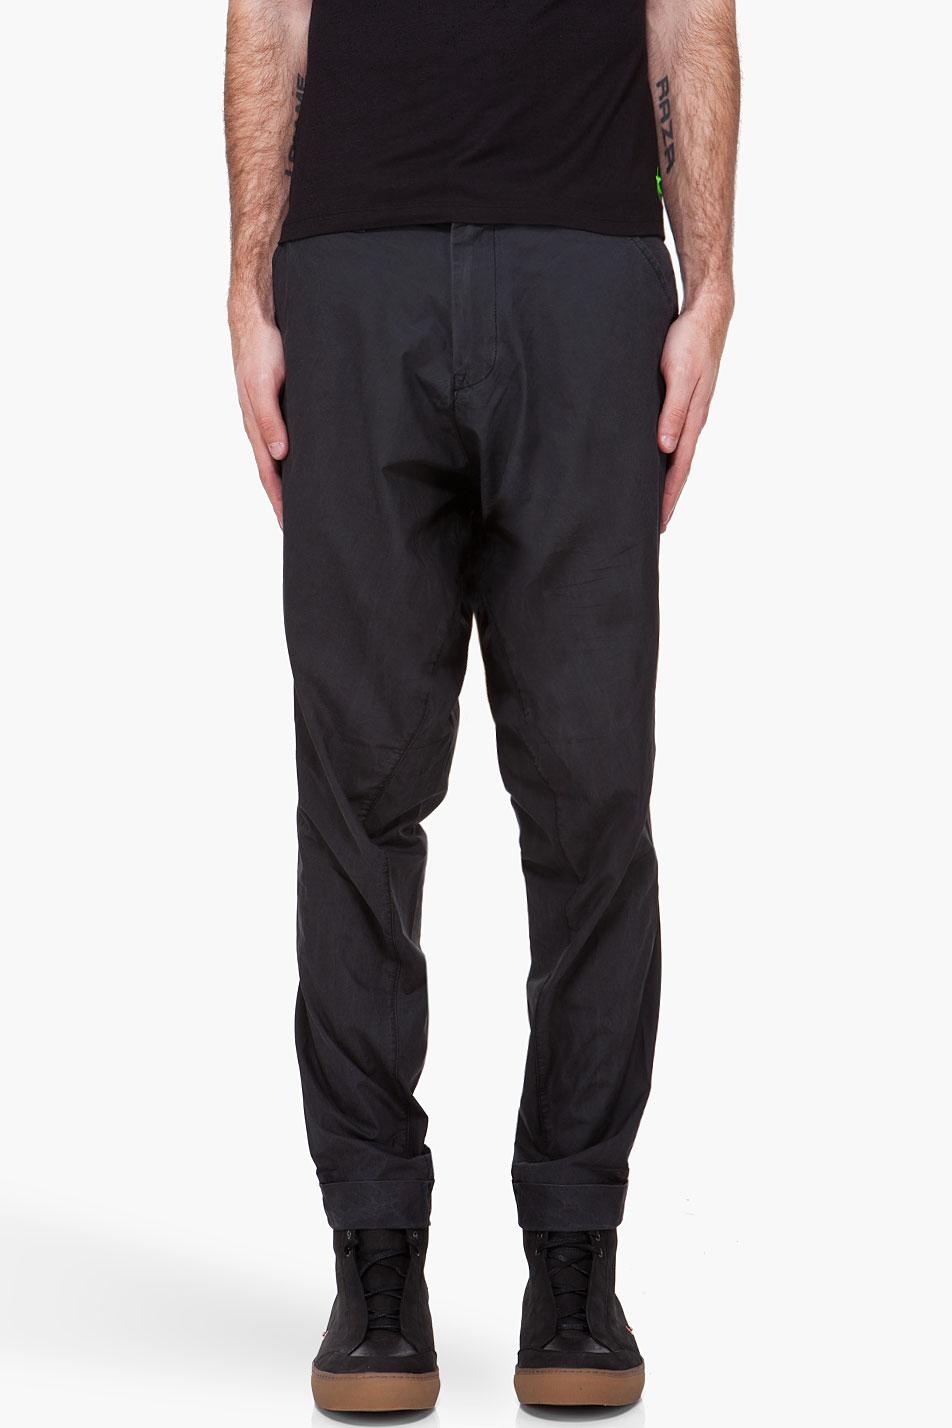 Carhartt Jeans Mens